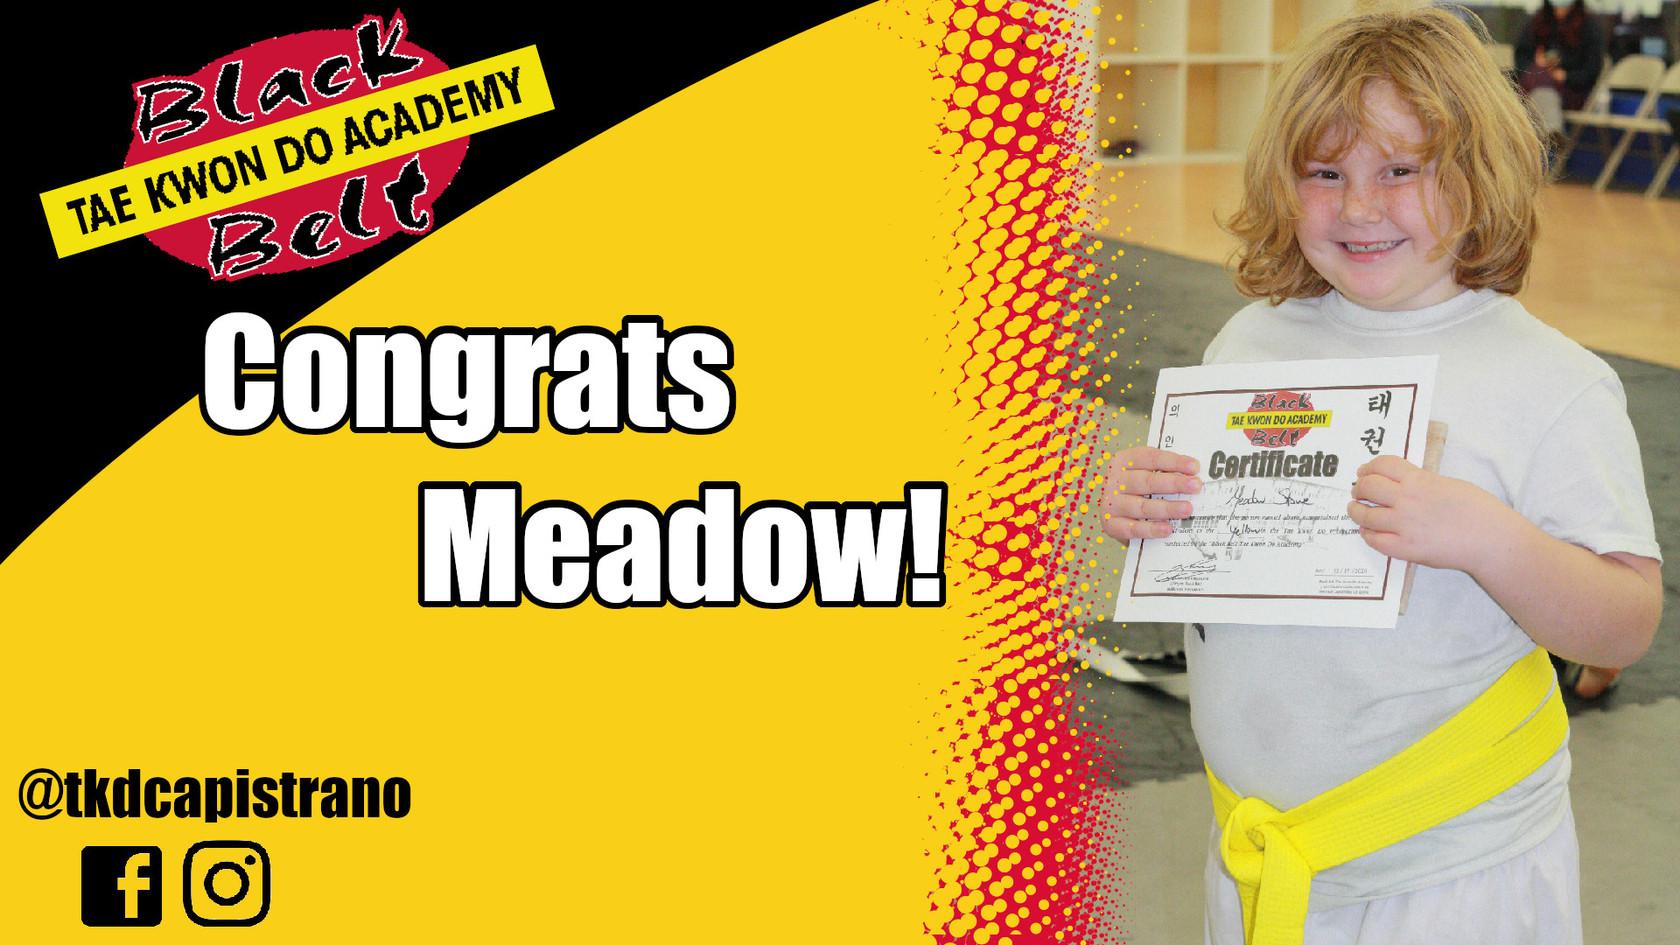 Congrats Meadow!